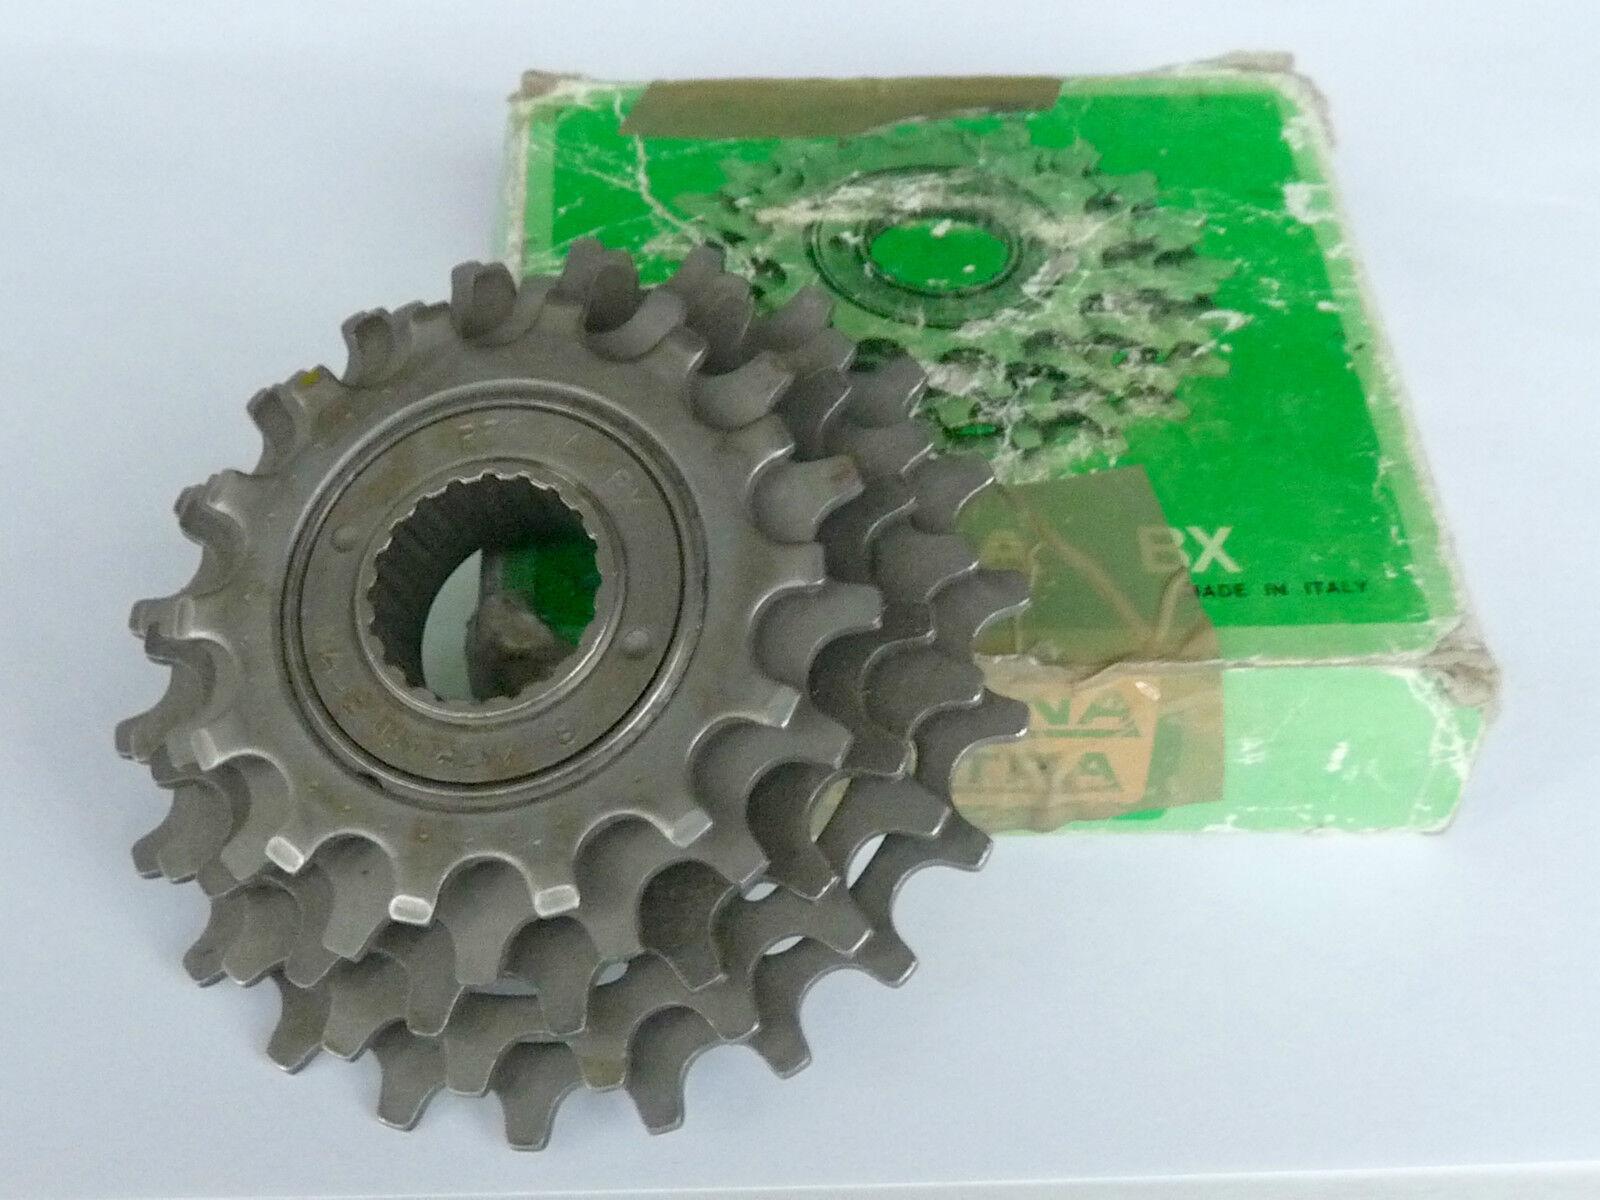 Regina Freewheel BX 5  Spd 14-22 ISO Thread Vintage Racing Bicycle NOS  discounts and more